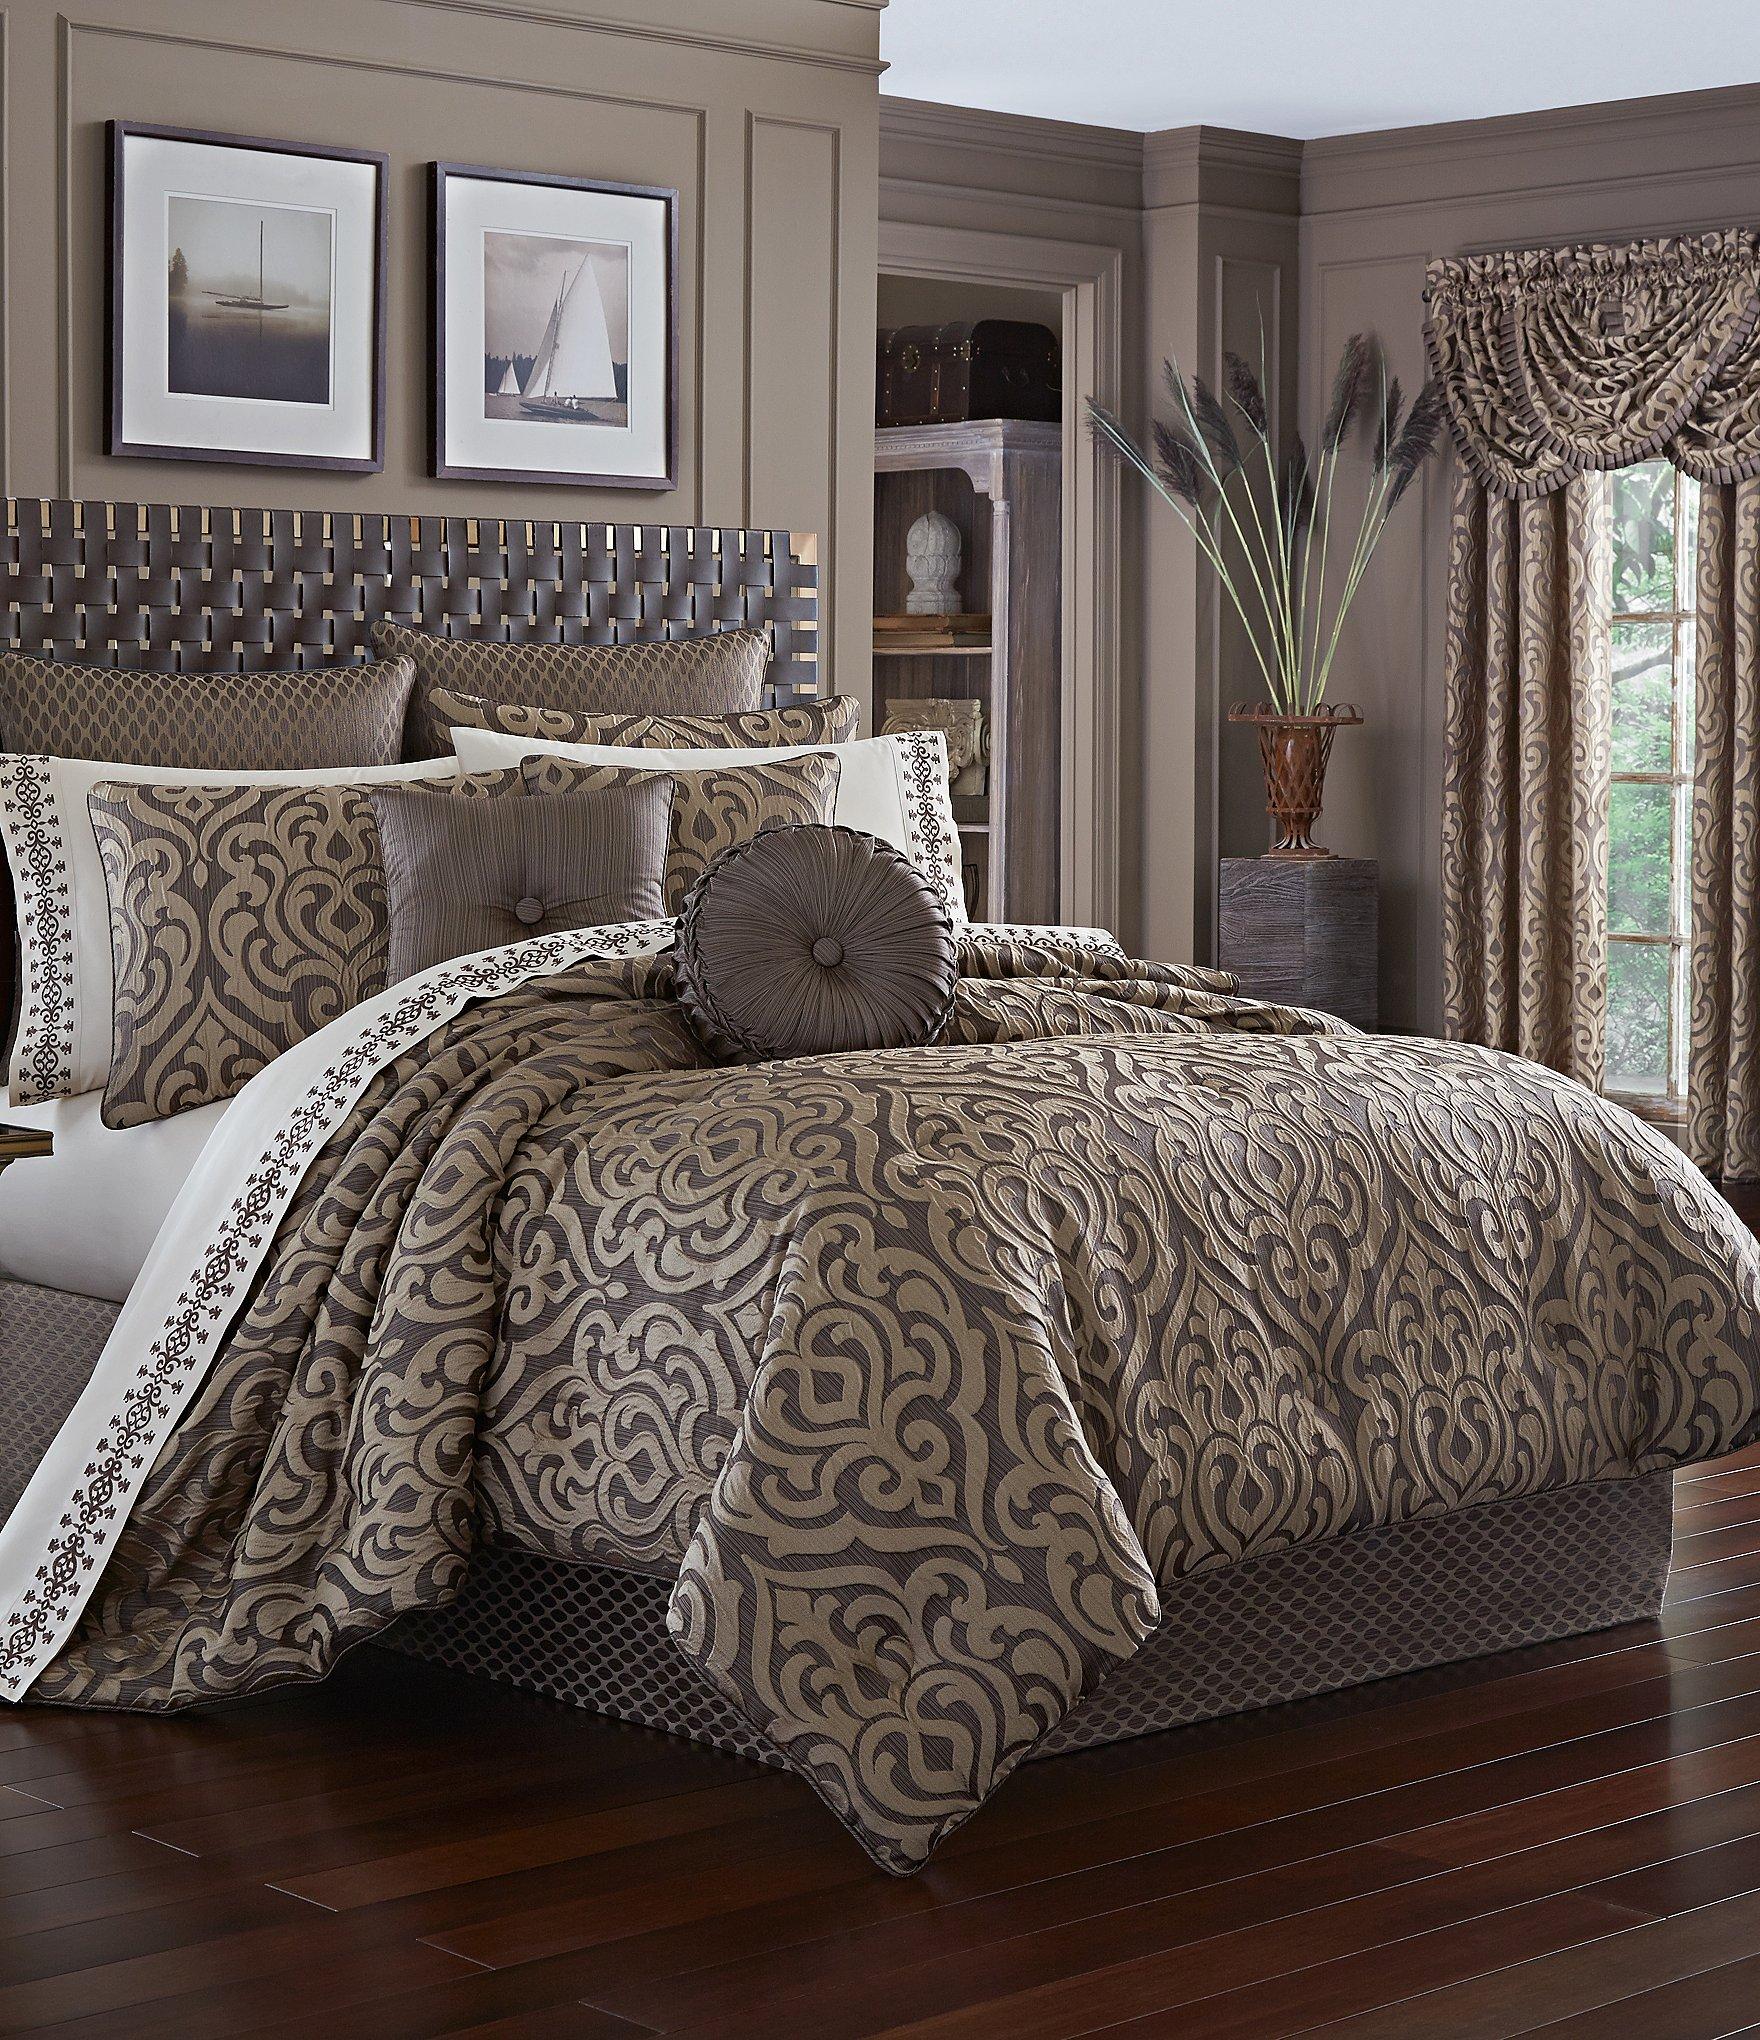 Elegant Damask Bedding Photograph Of Bed Decor